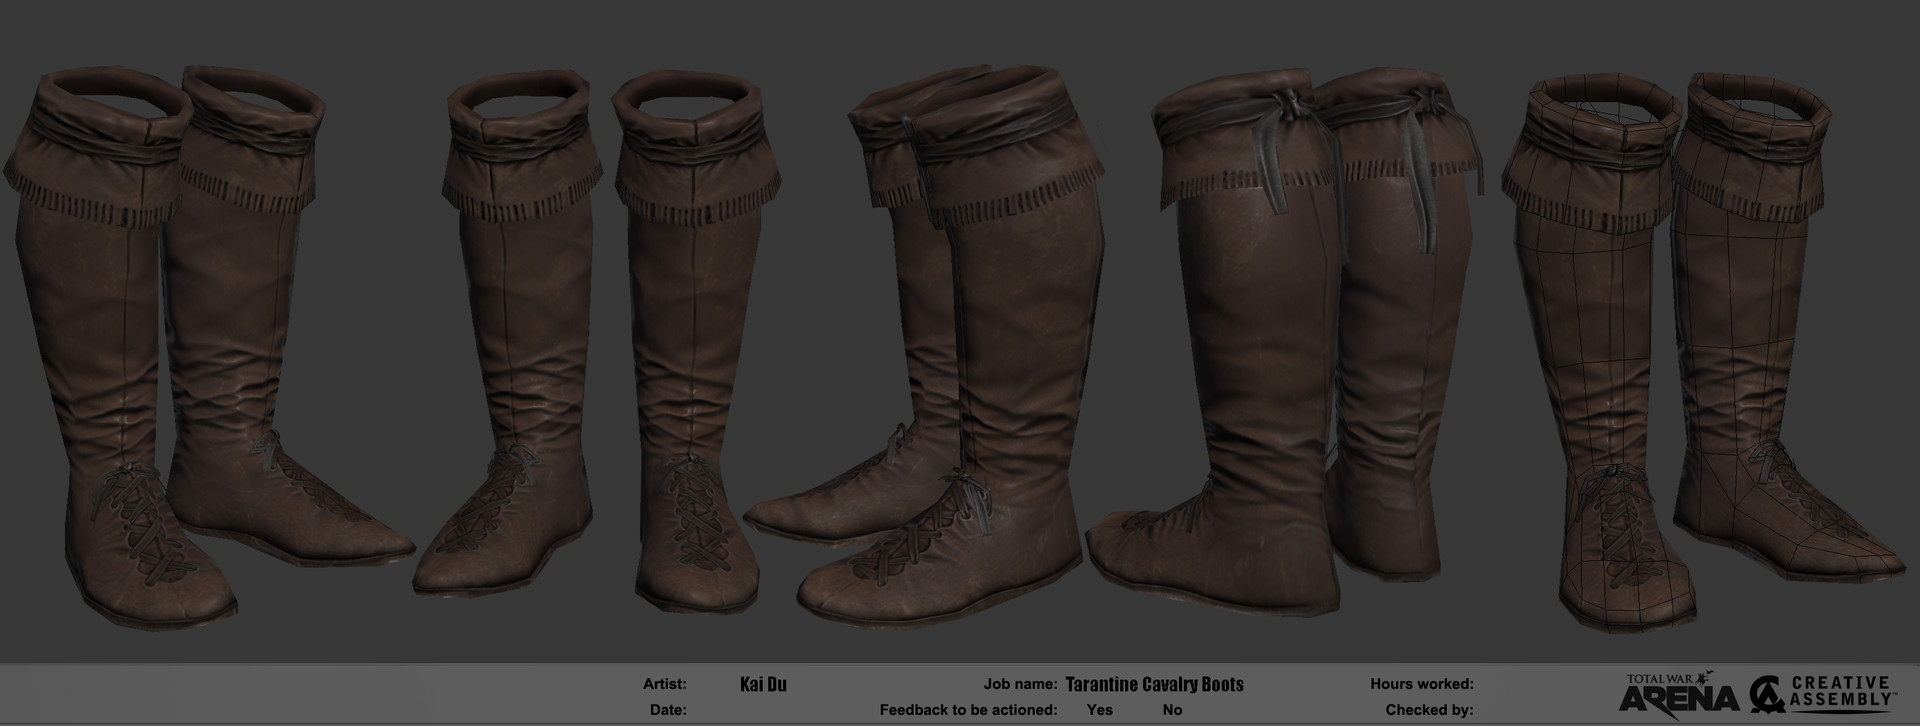 Kai du kai du premium tarantine cavalry boots